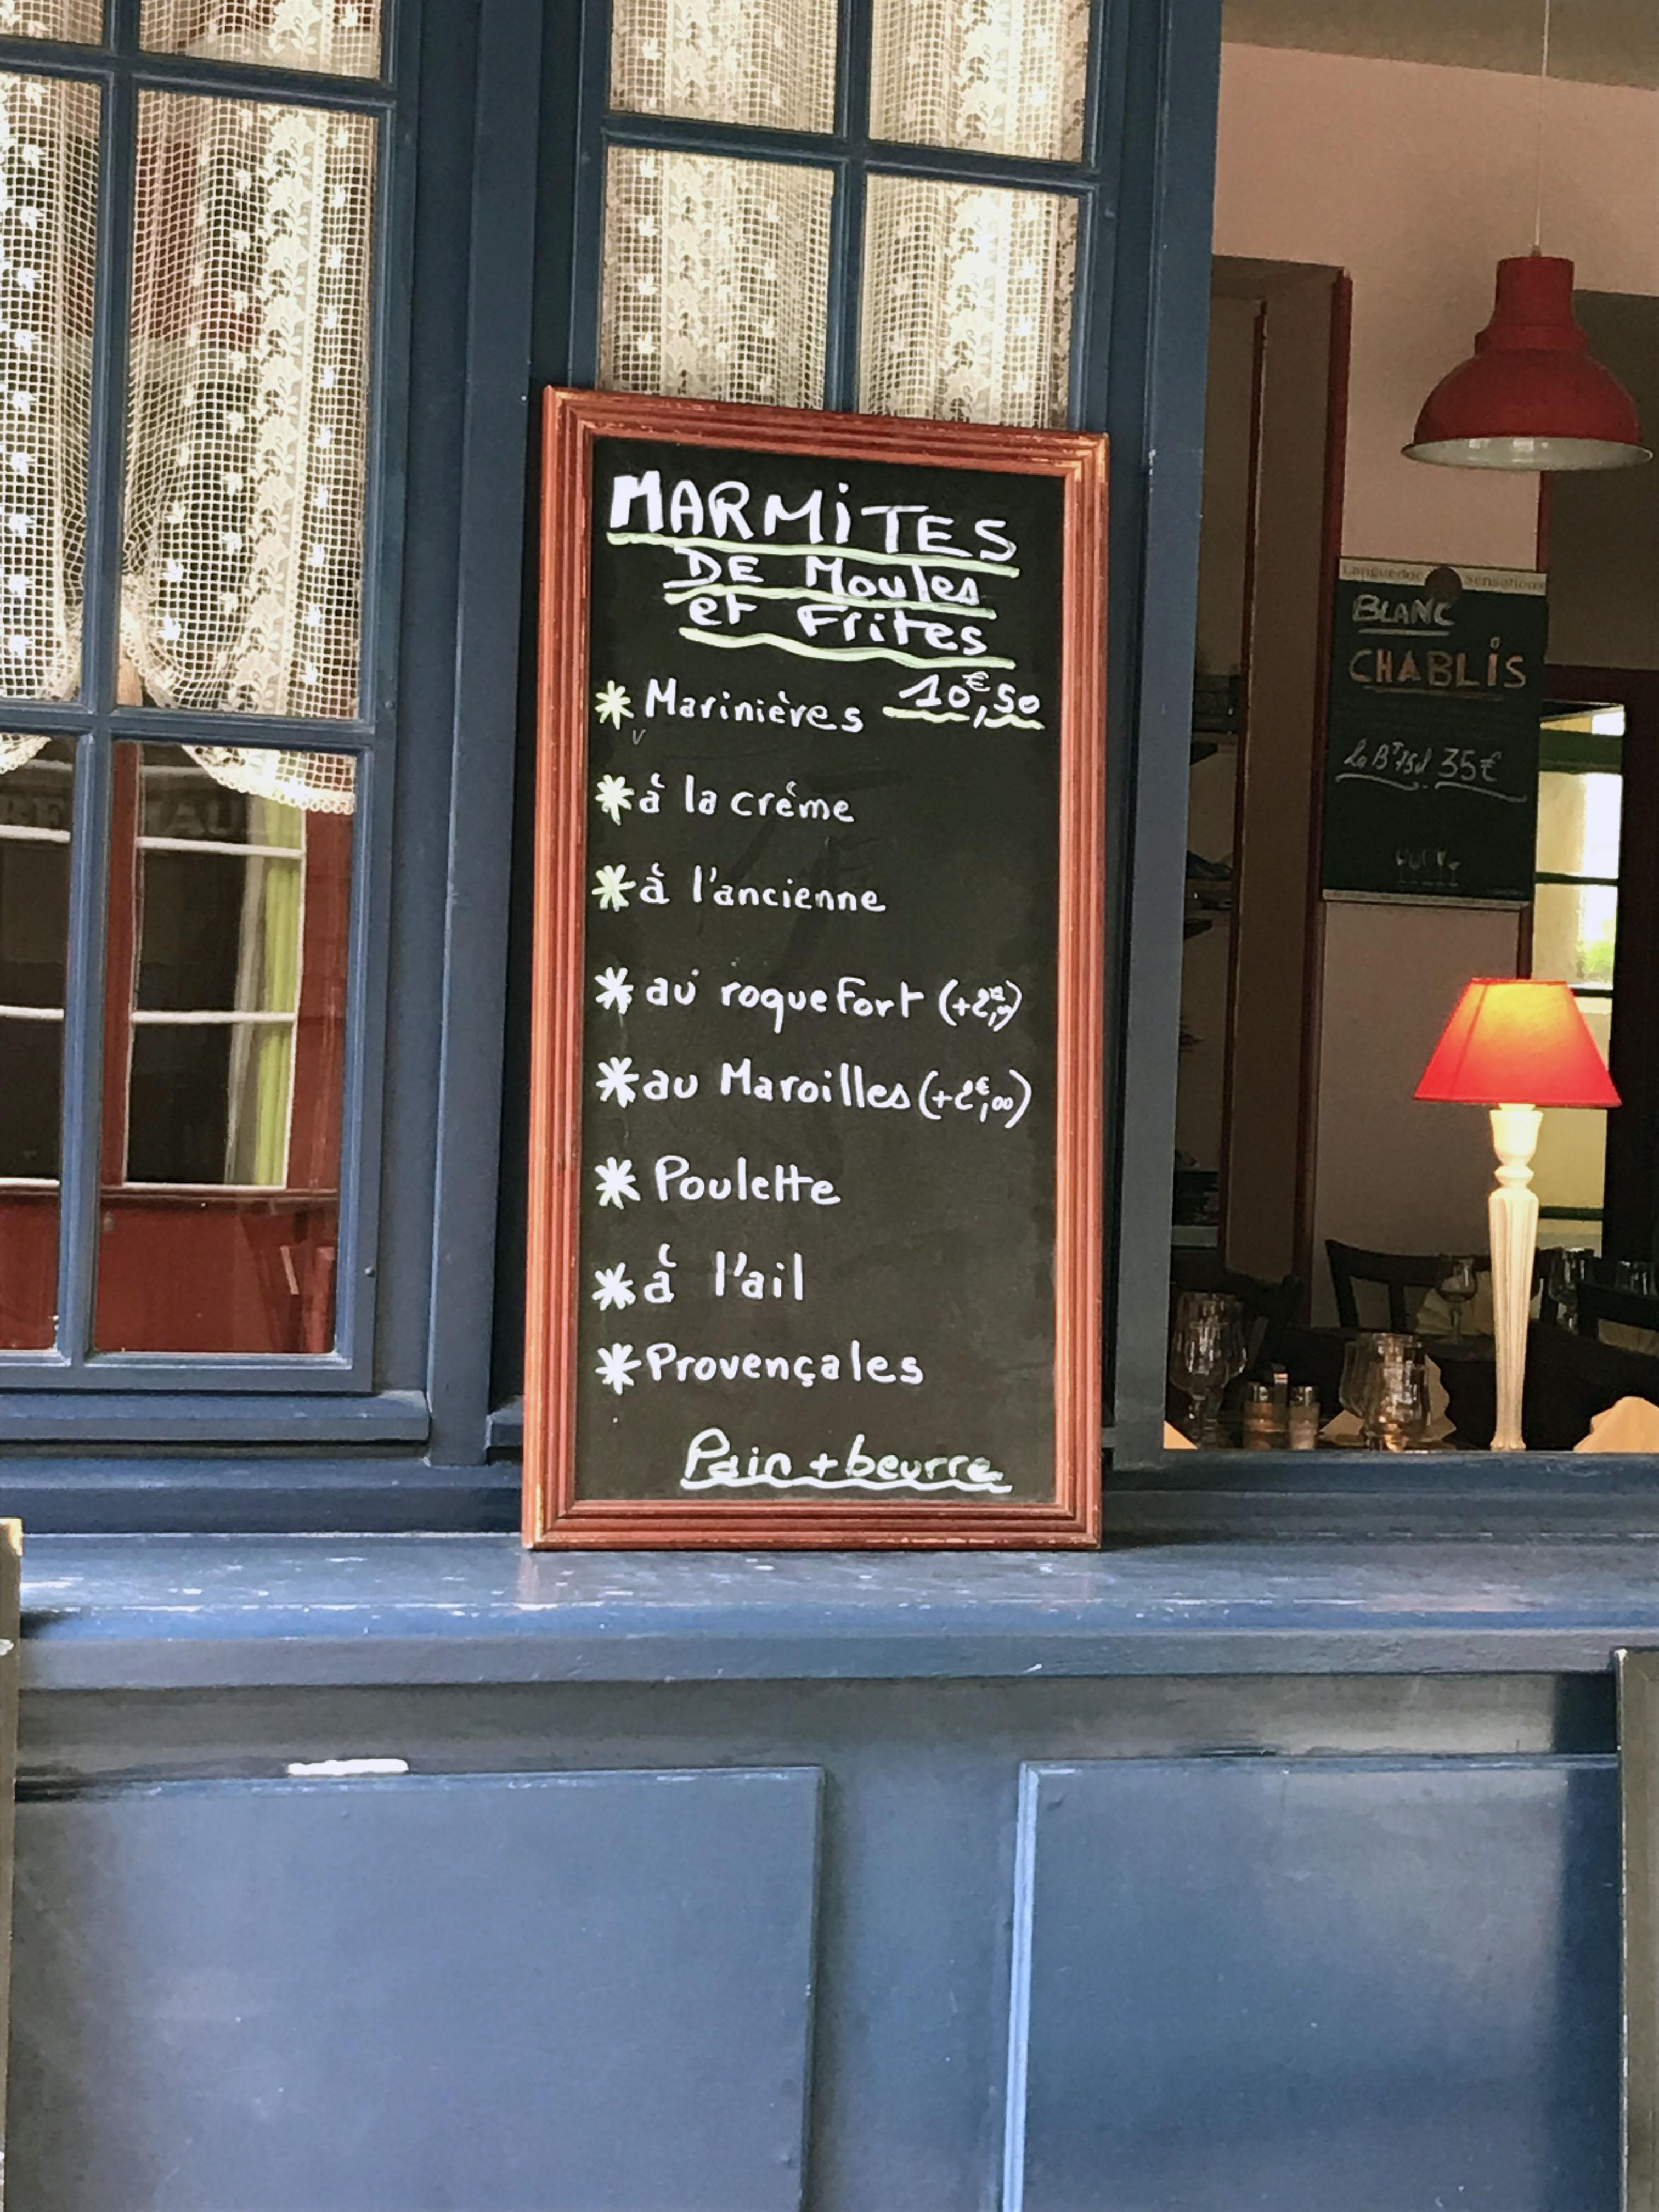 In Boulogne sur meer gibt es lecker Muscheln